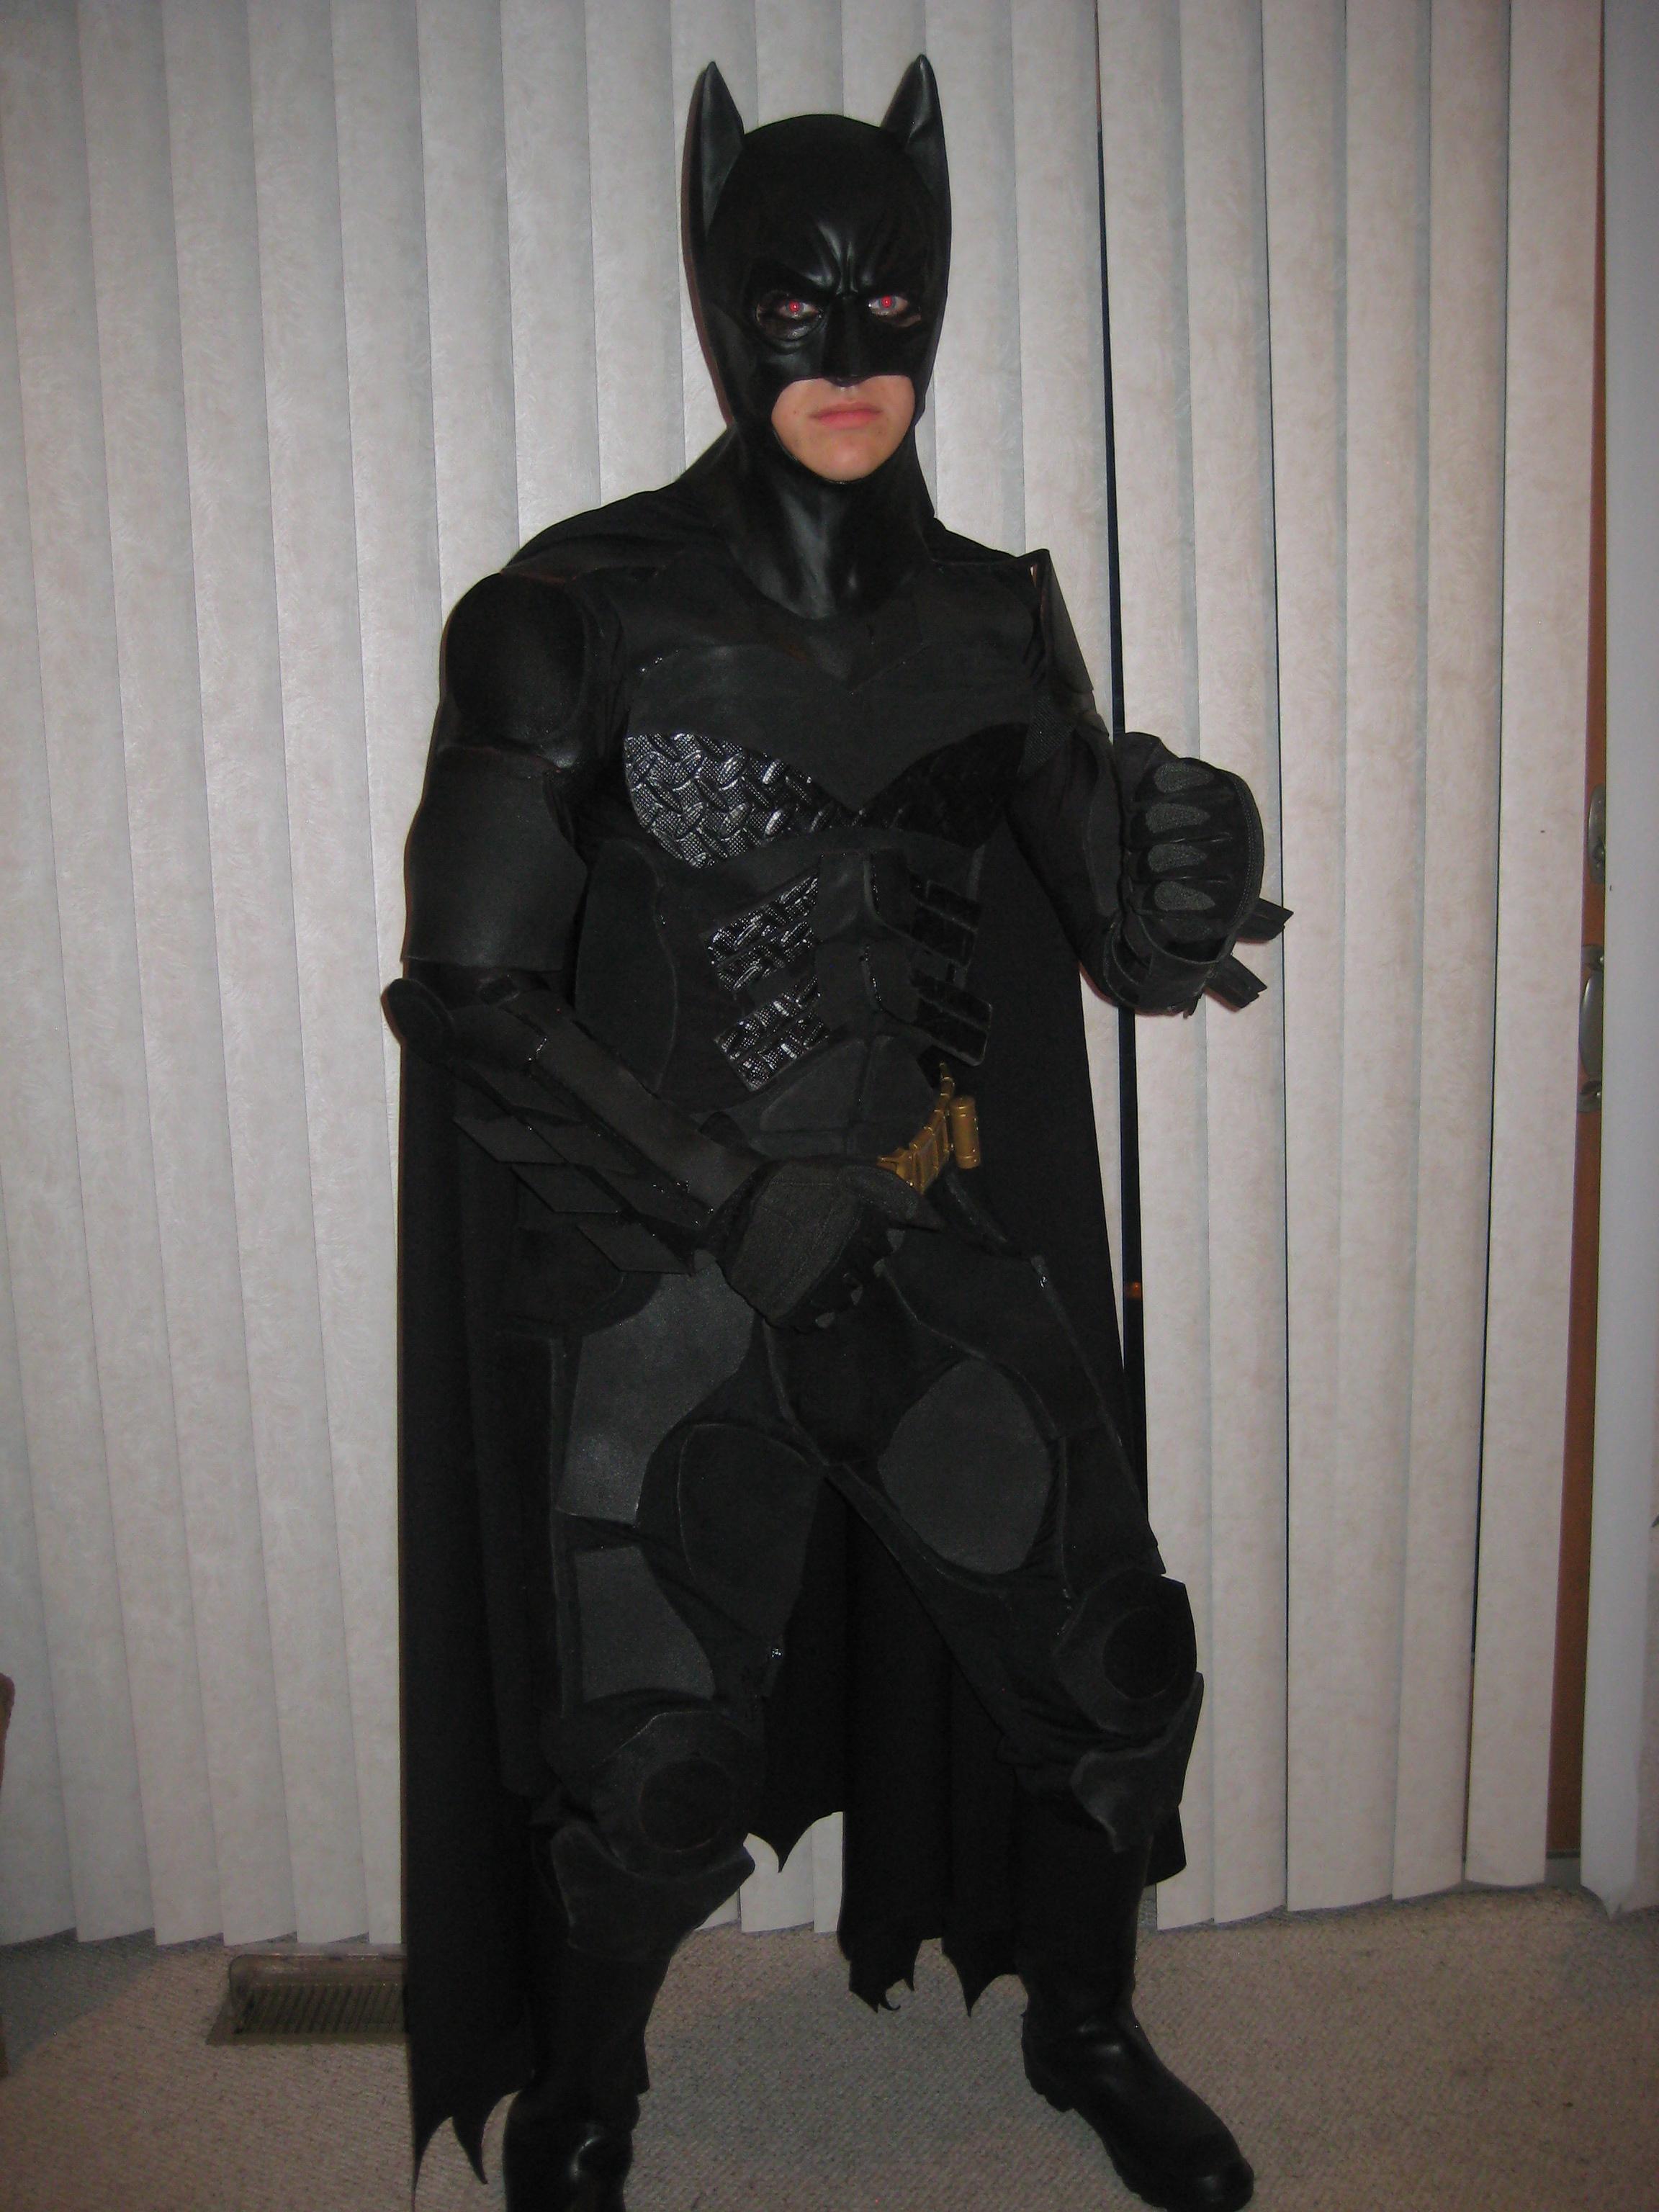 Batman Costume (The Dark Knight Rises)